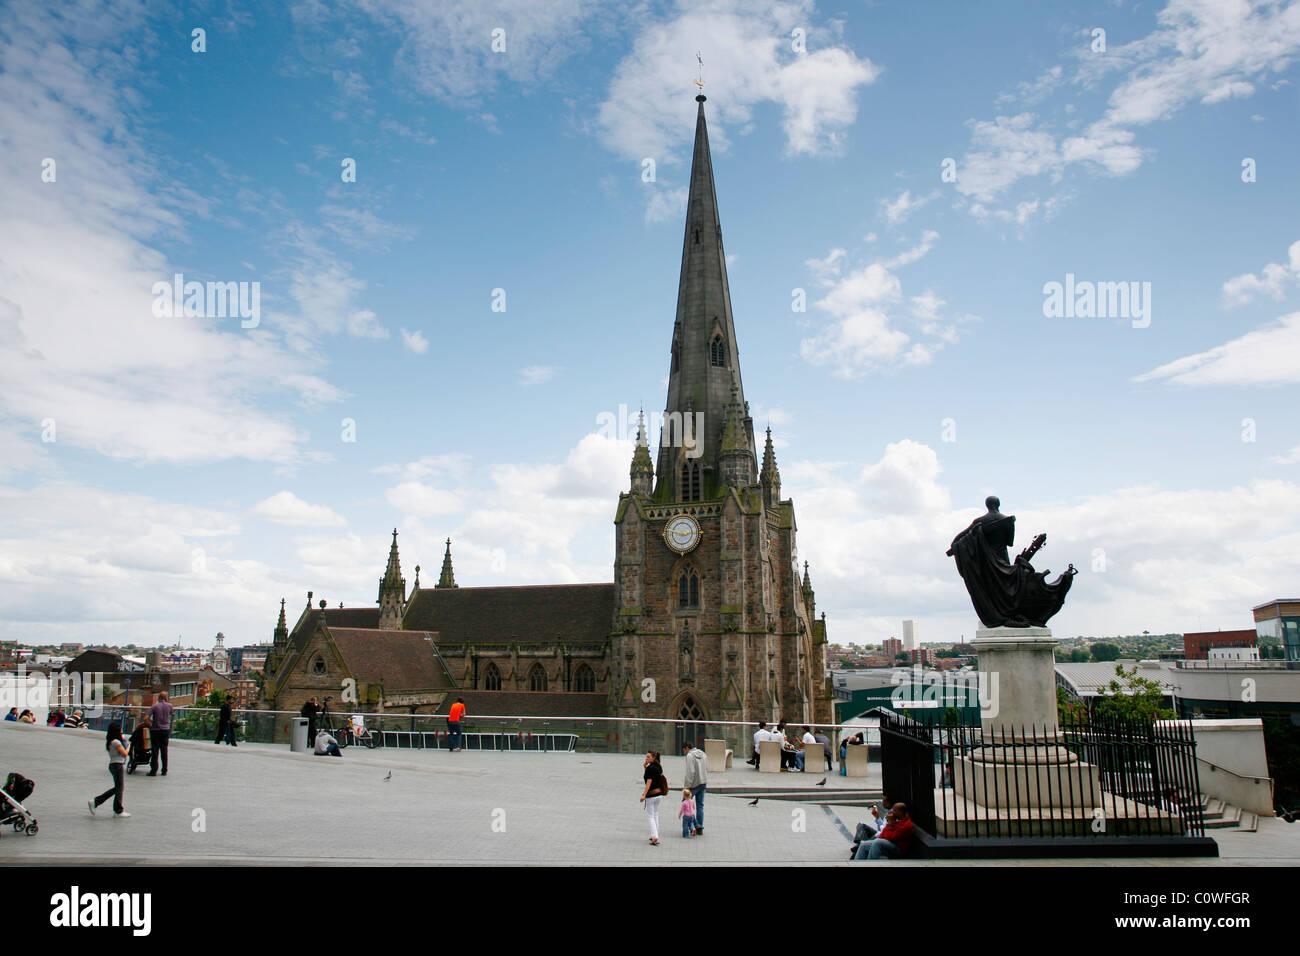 Saint Martin church, Birmingham, England, UK. - Stock Image